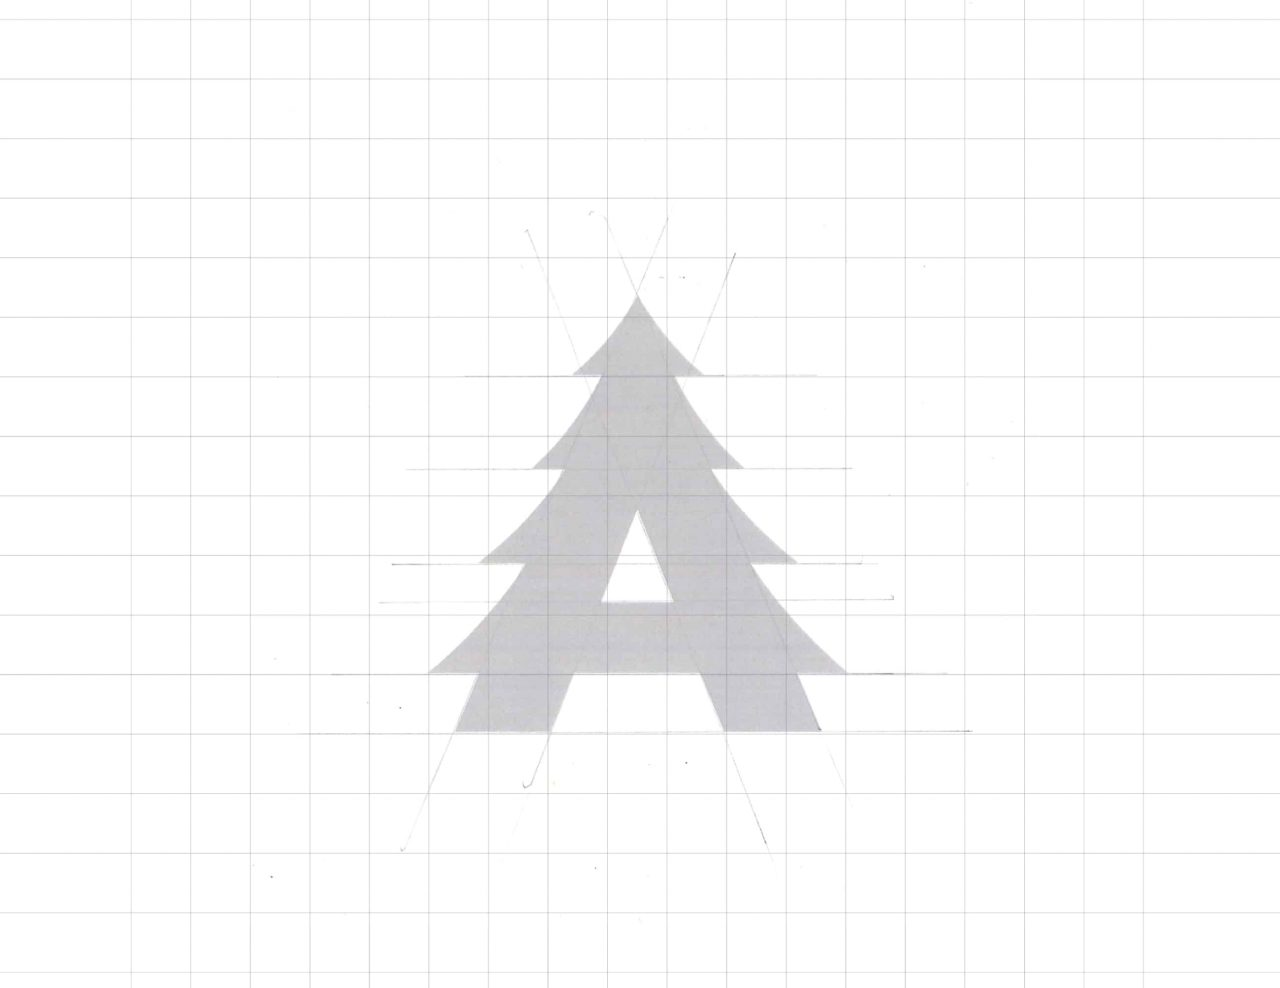 arbor-logo-anatomy